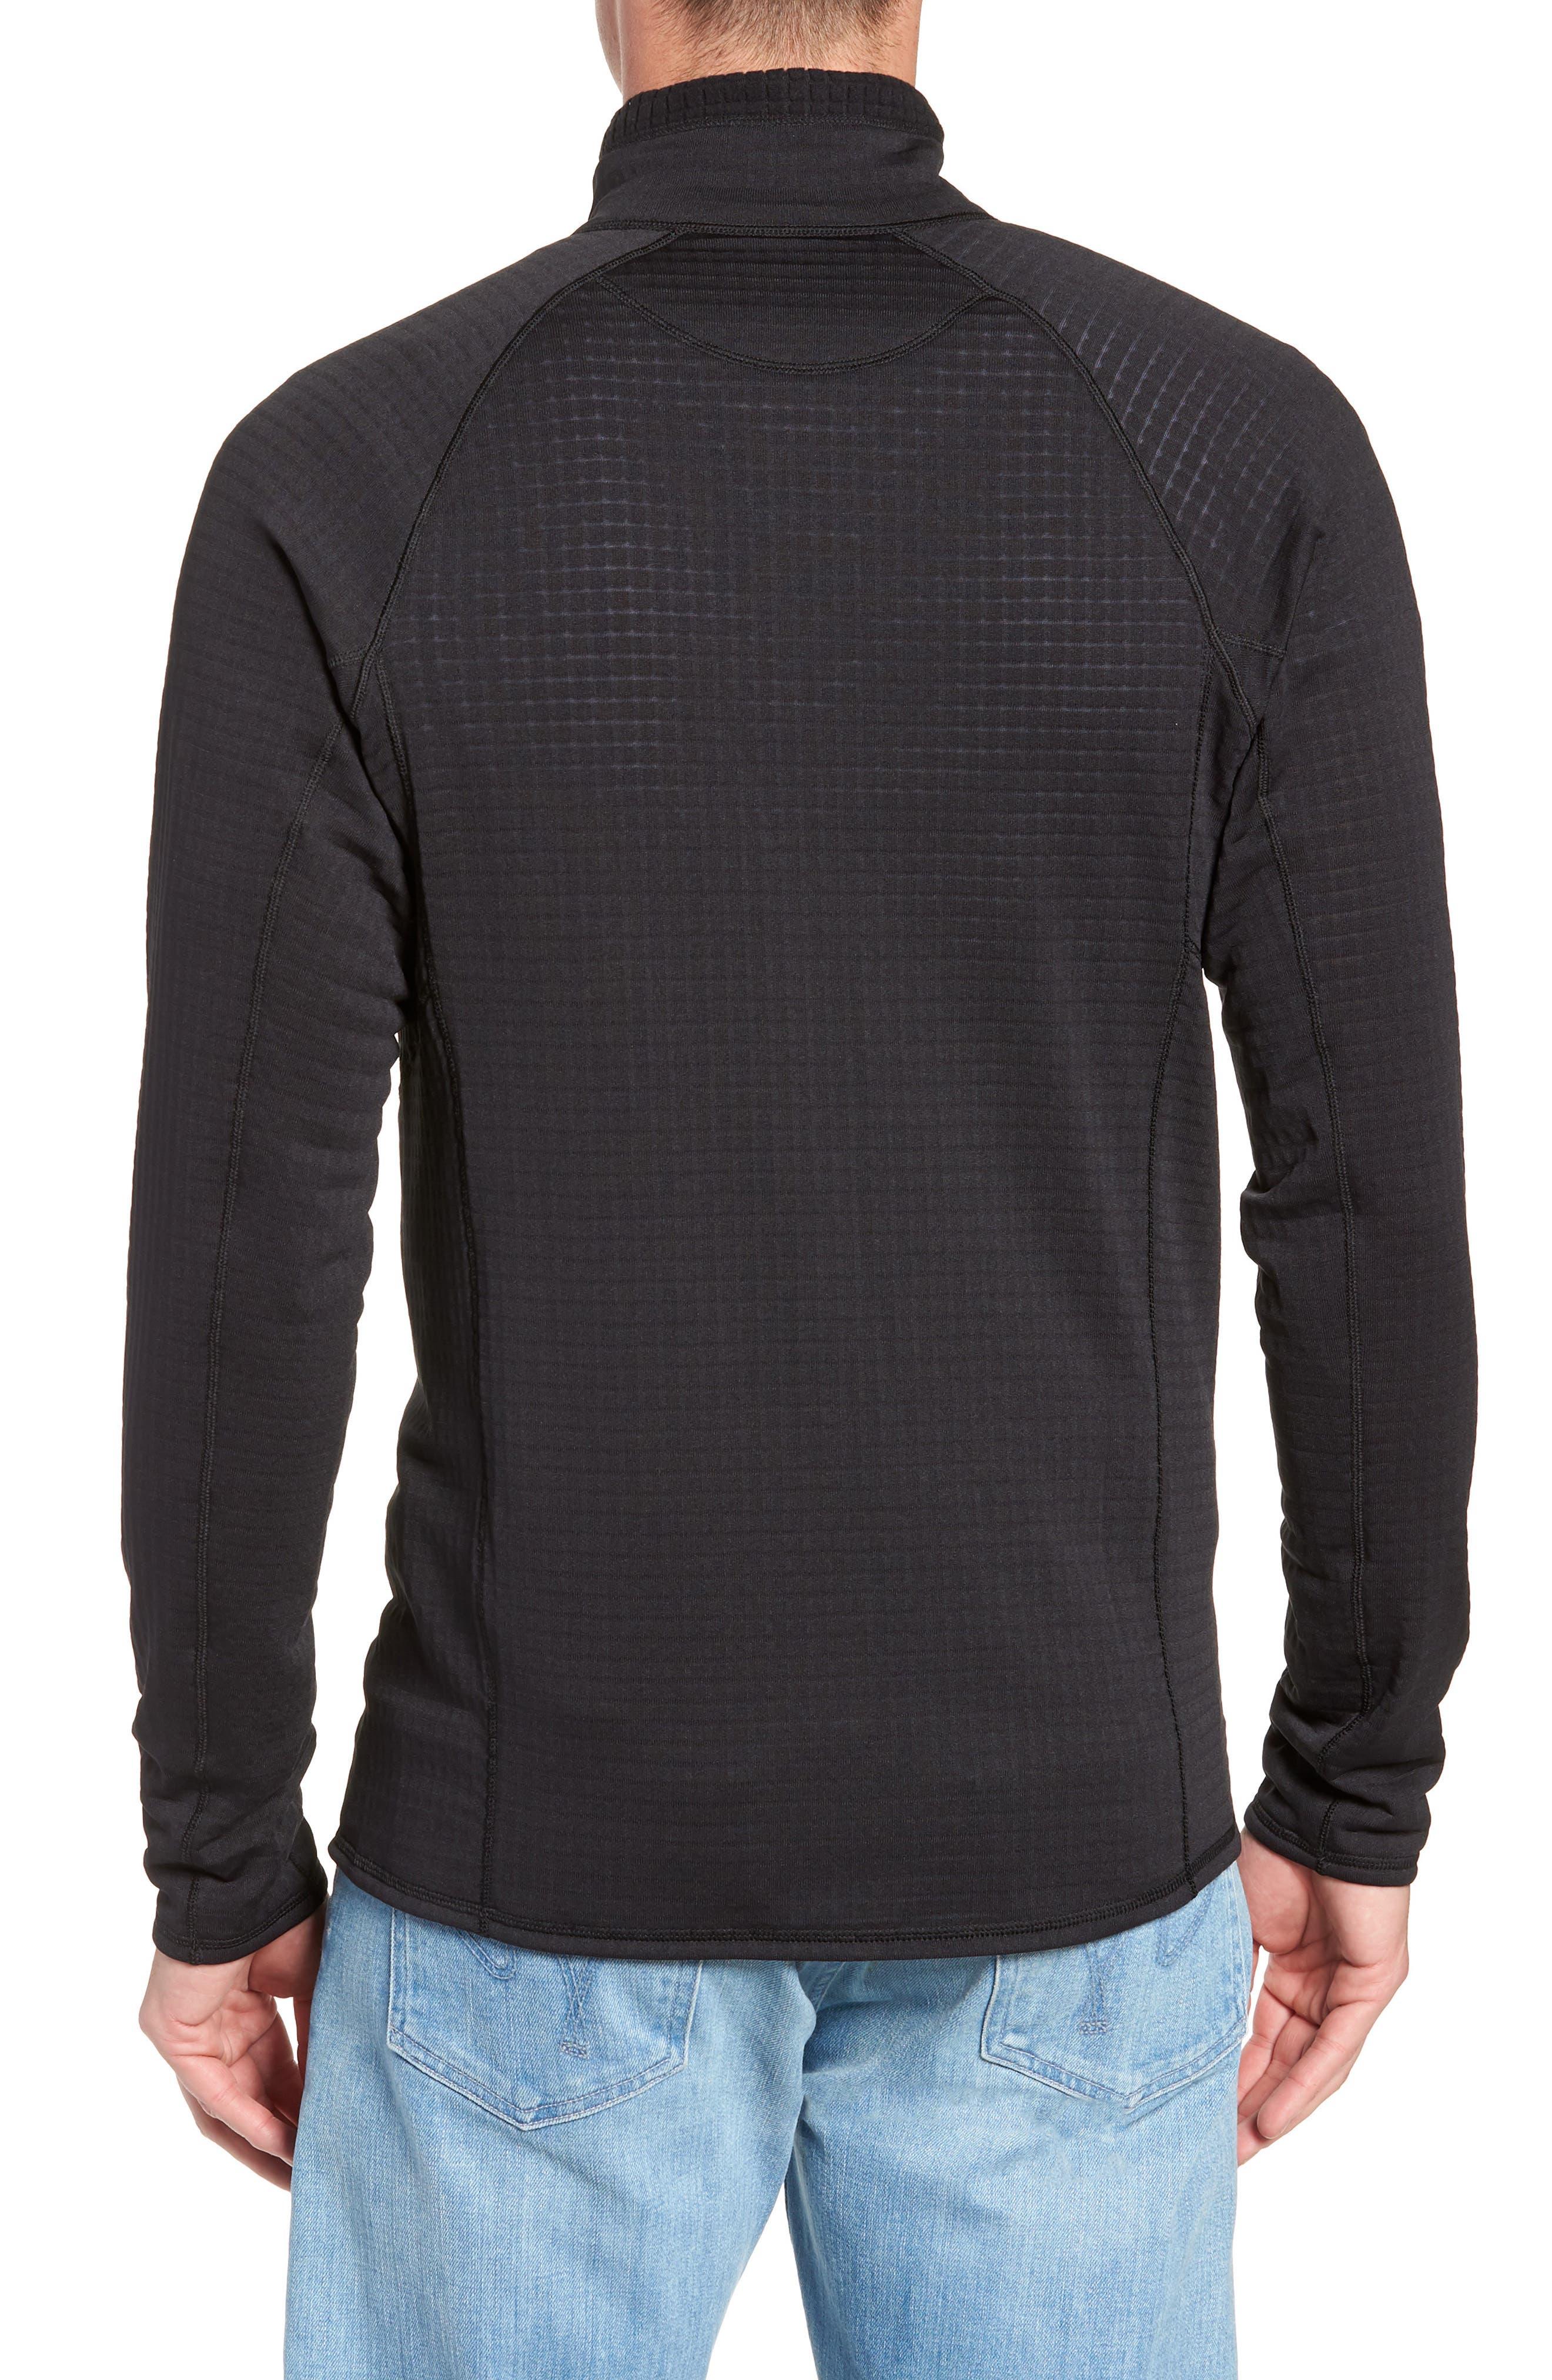 R1<sup>®</sup> Full Zip Jacket,                             Alternate thumbnail 2, color,                             BLACK